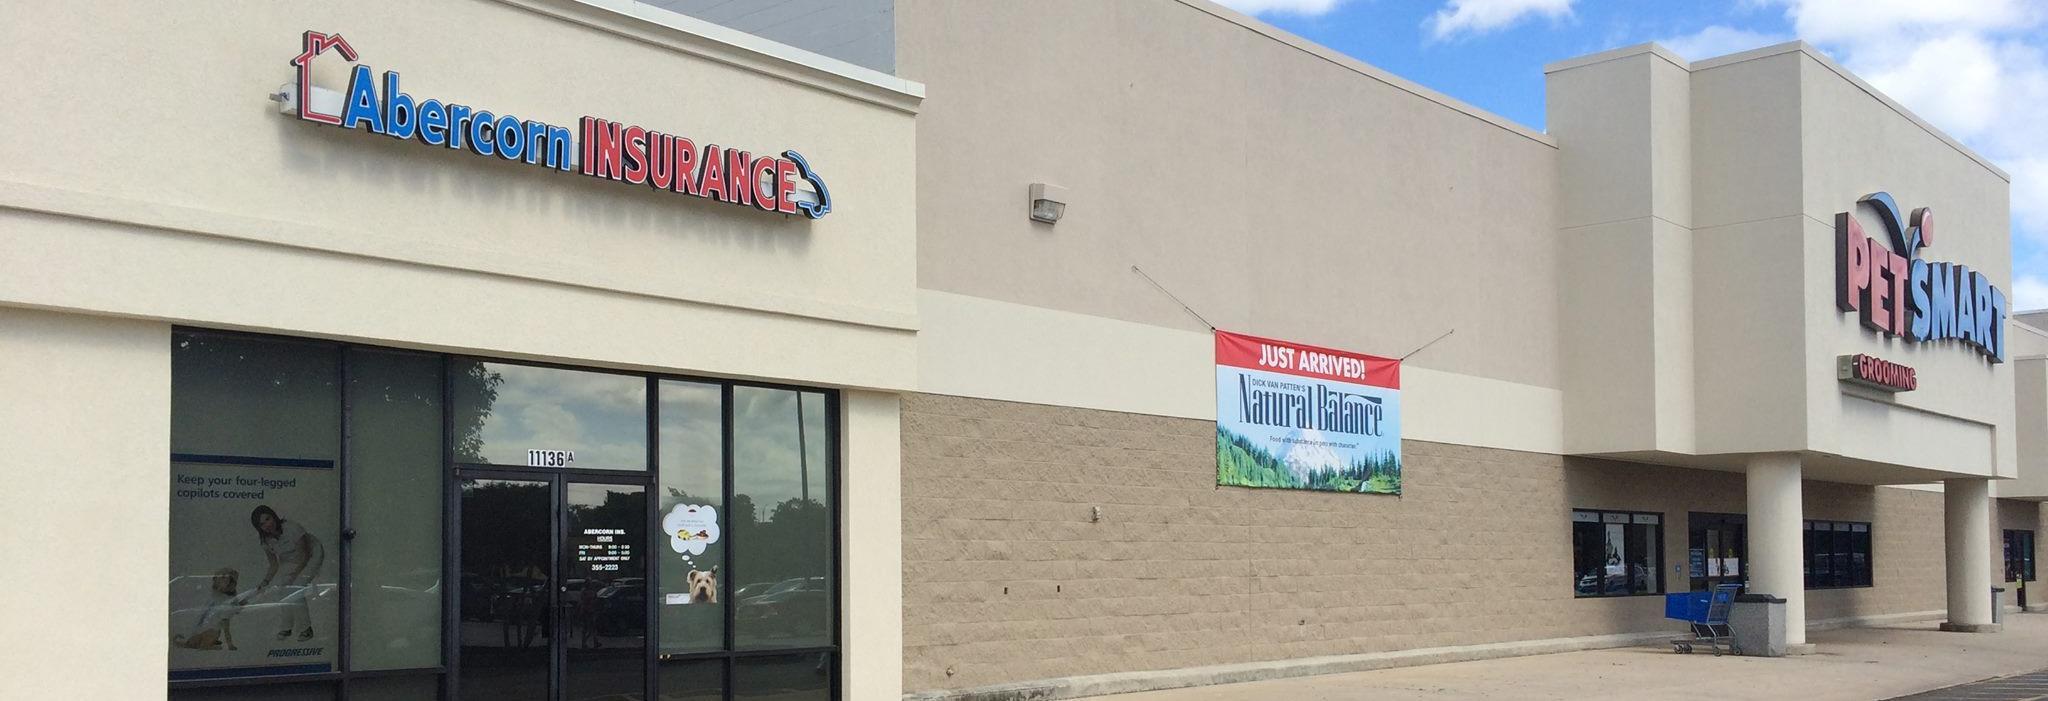 Abercorn Insurance banner Savannah, GA